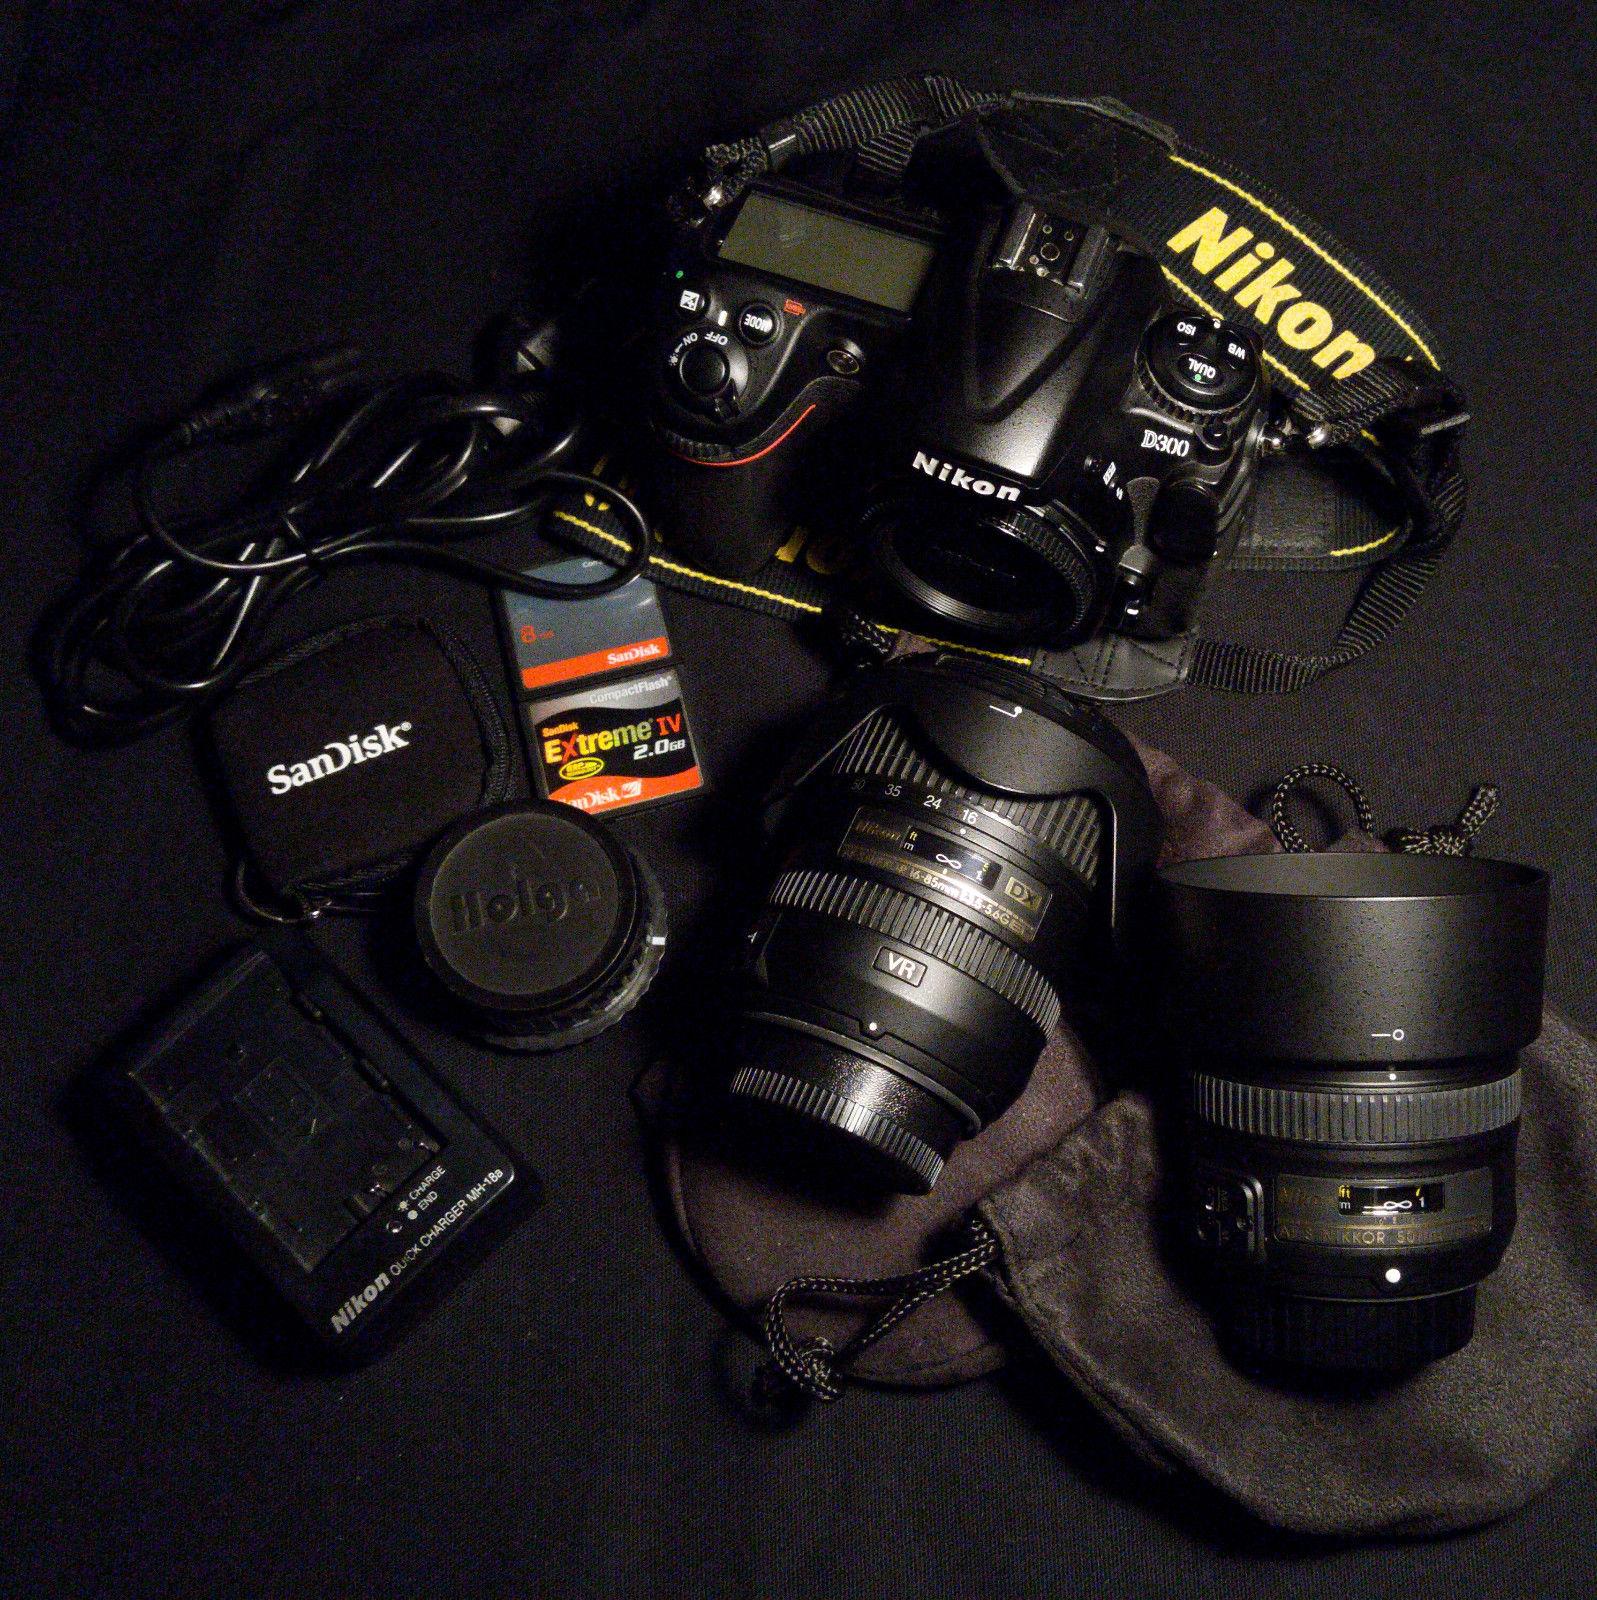 Nikon D300 – Digitale Spiegelreflexkamera, drei Objektive, Zubehörpaket.